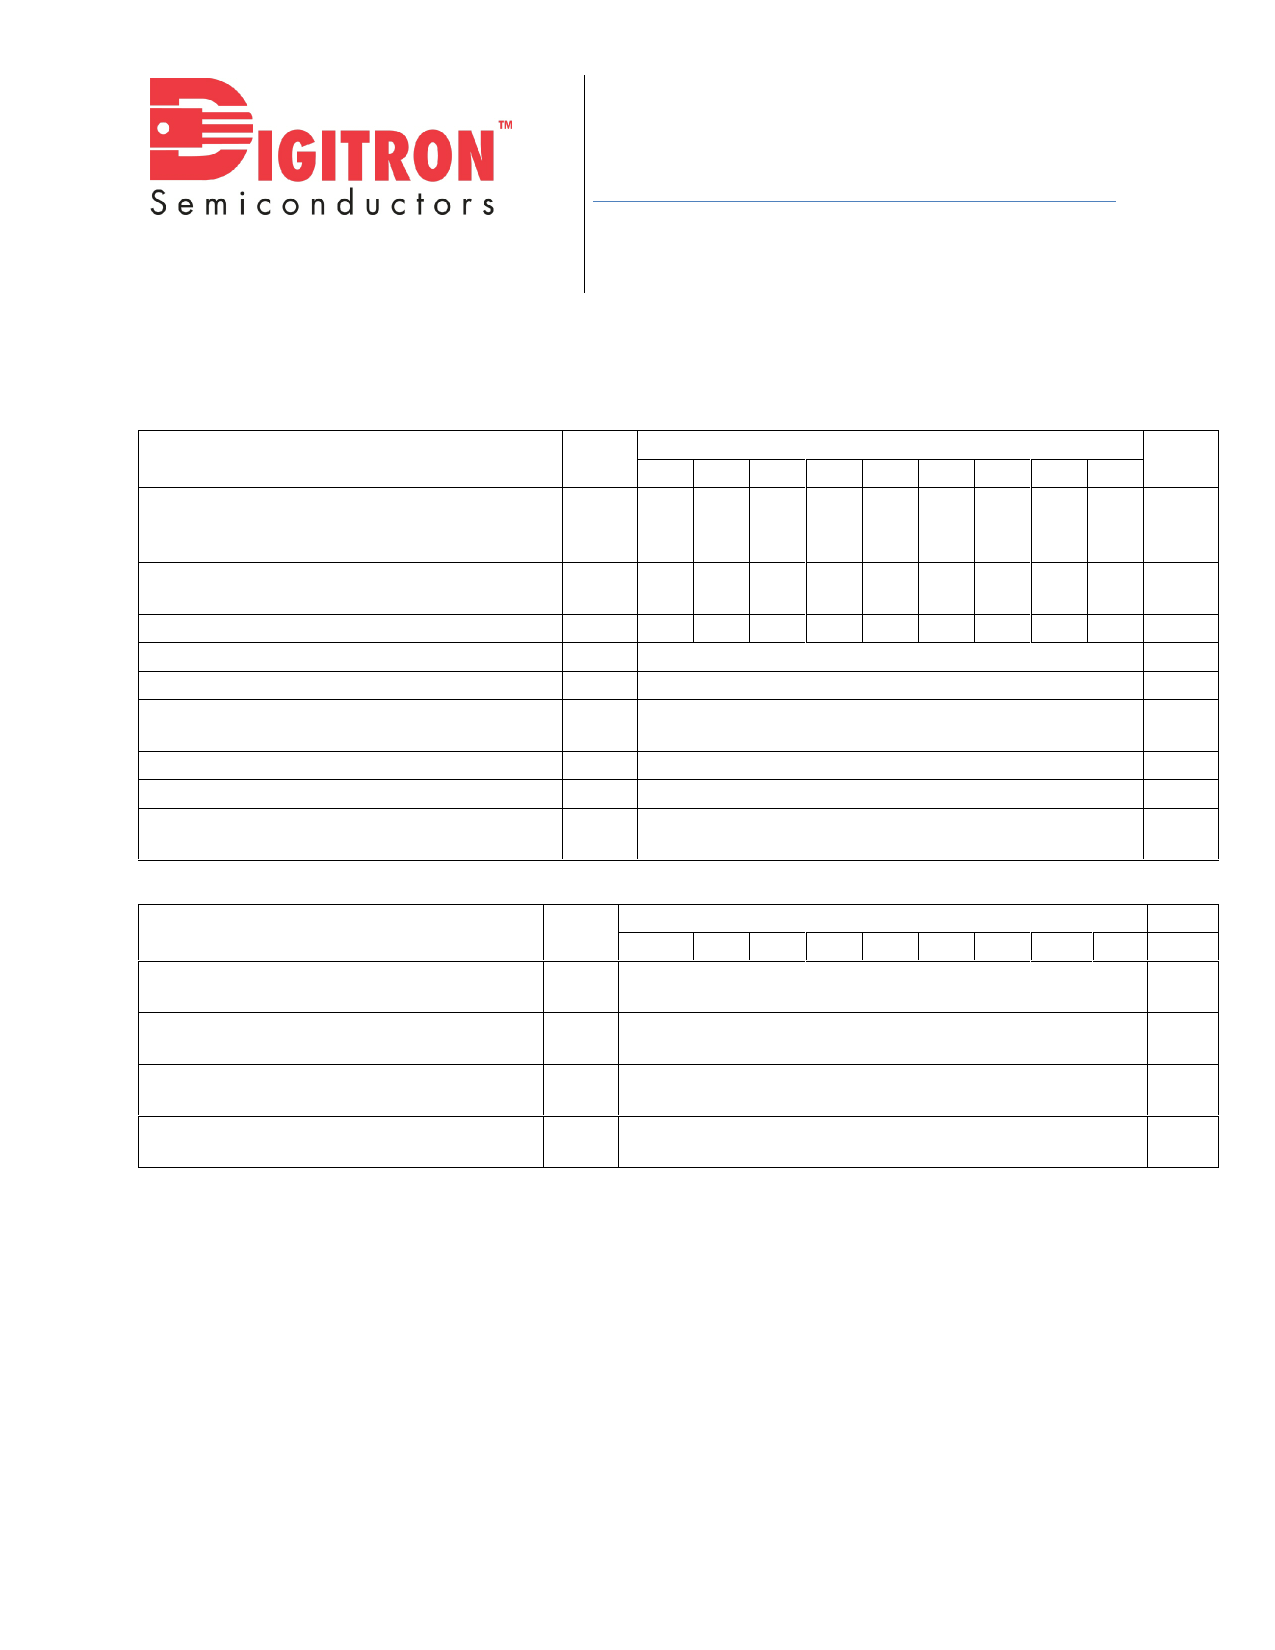 MR1124 데이터시트 및 MR1124 PDF